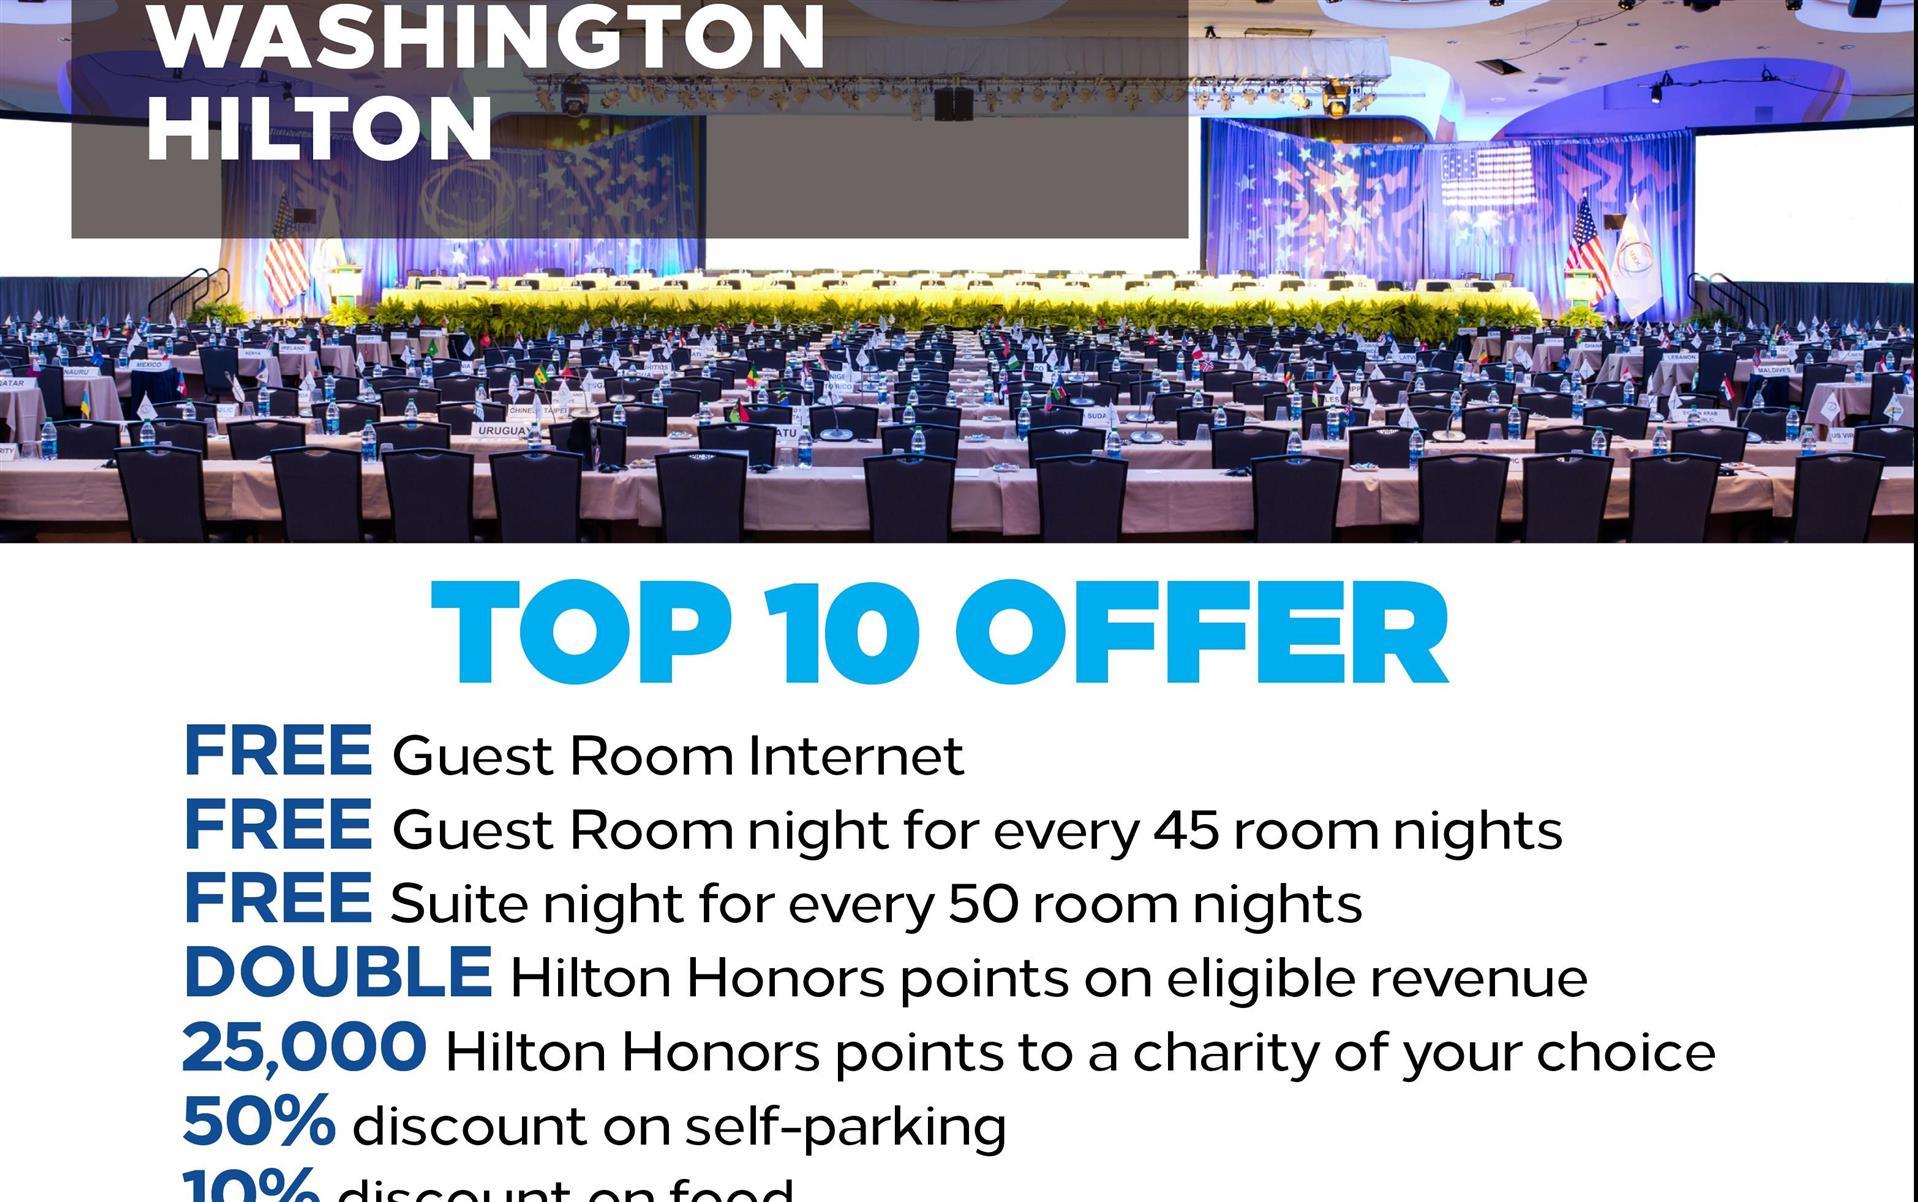 Meetings and events at Washington Hilton, Washington, DC, US